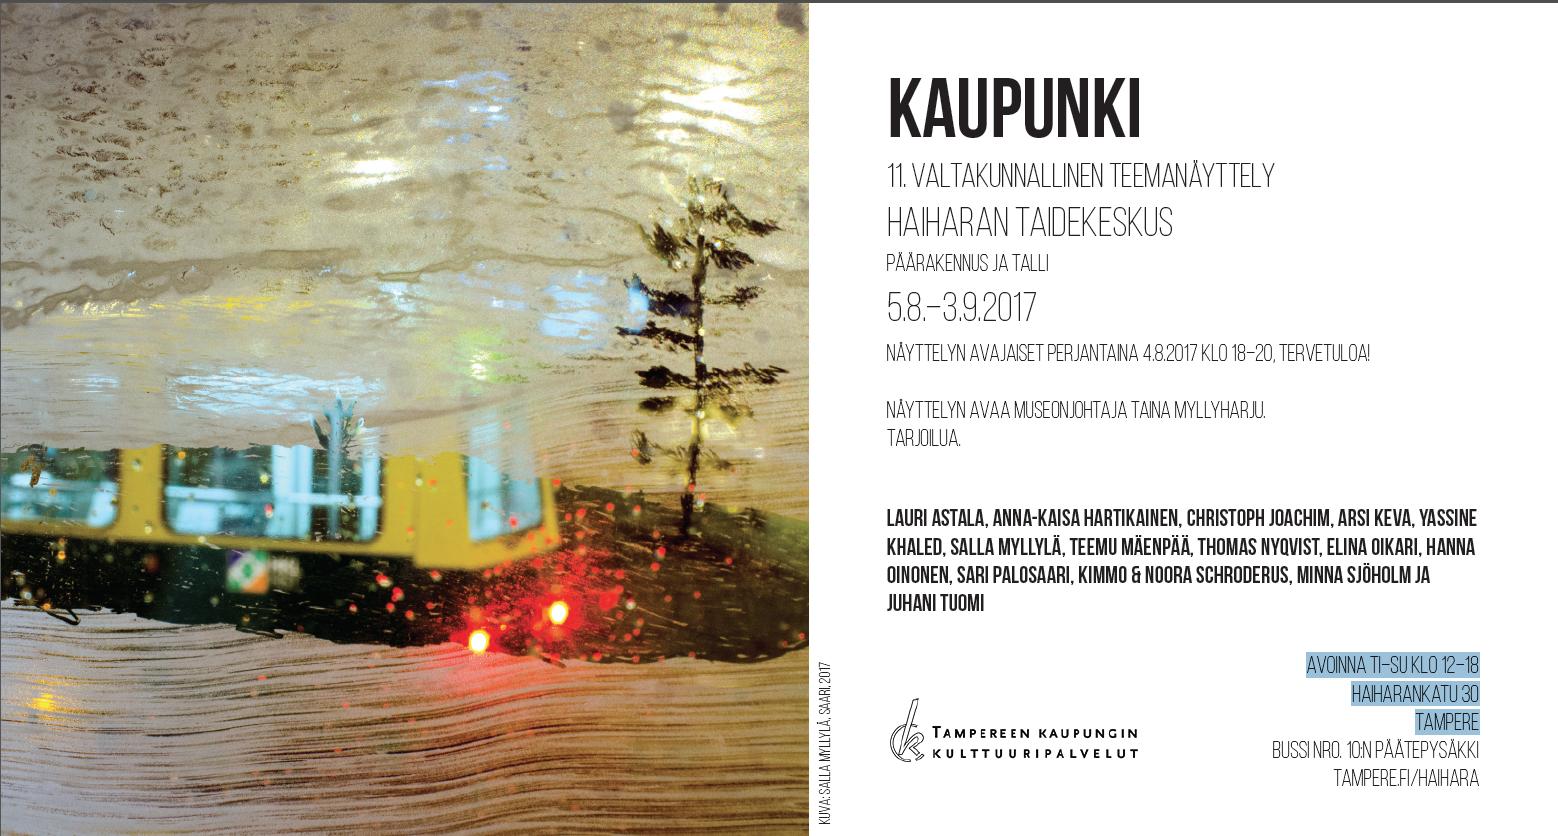 Eventbild für Christoph Joachim u.a. // KAUPUNKI